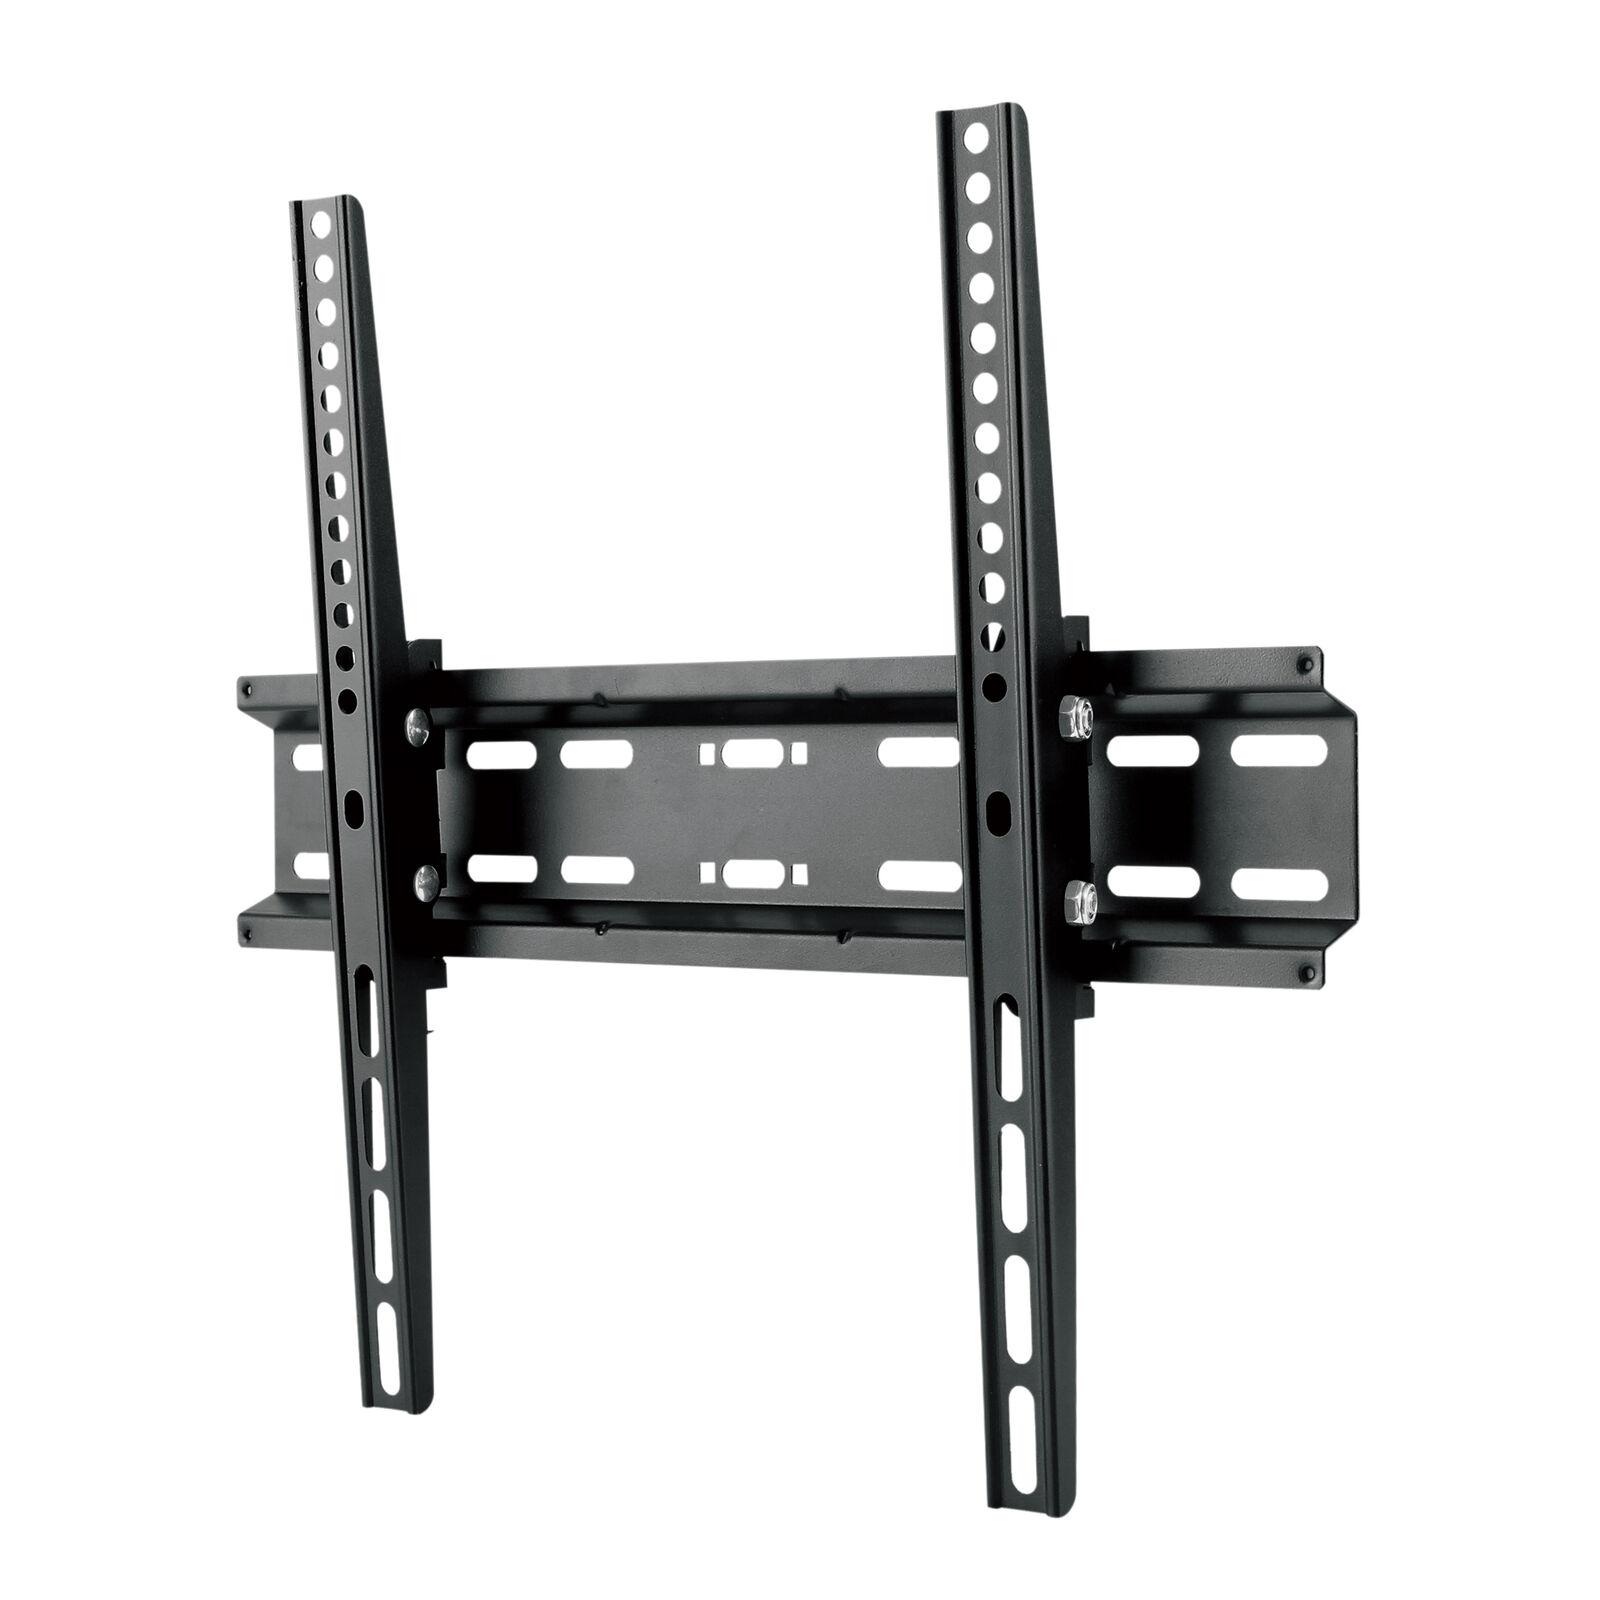 LCD LED TV Wandhalterung Halterung A1 für Panasonic TX-L42EN33 Xklusiv